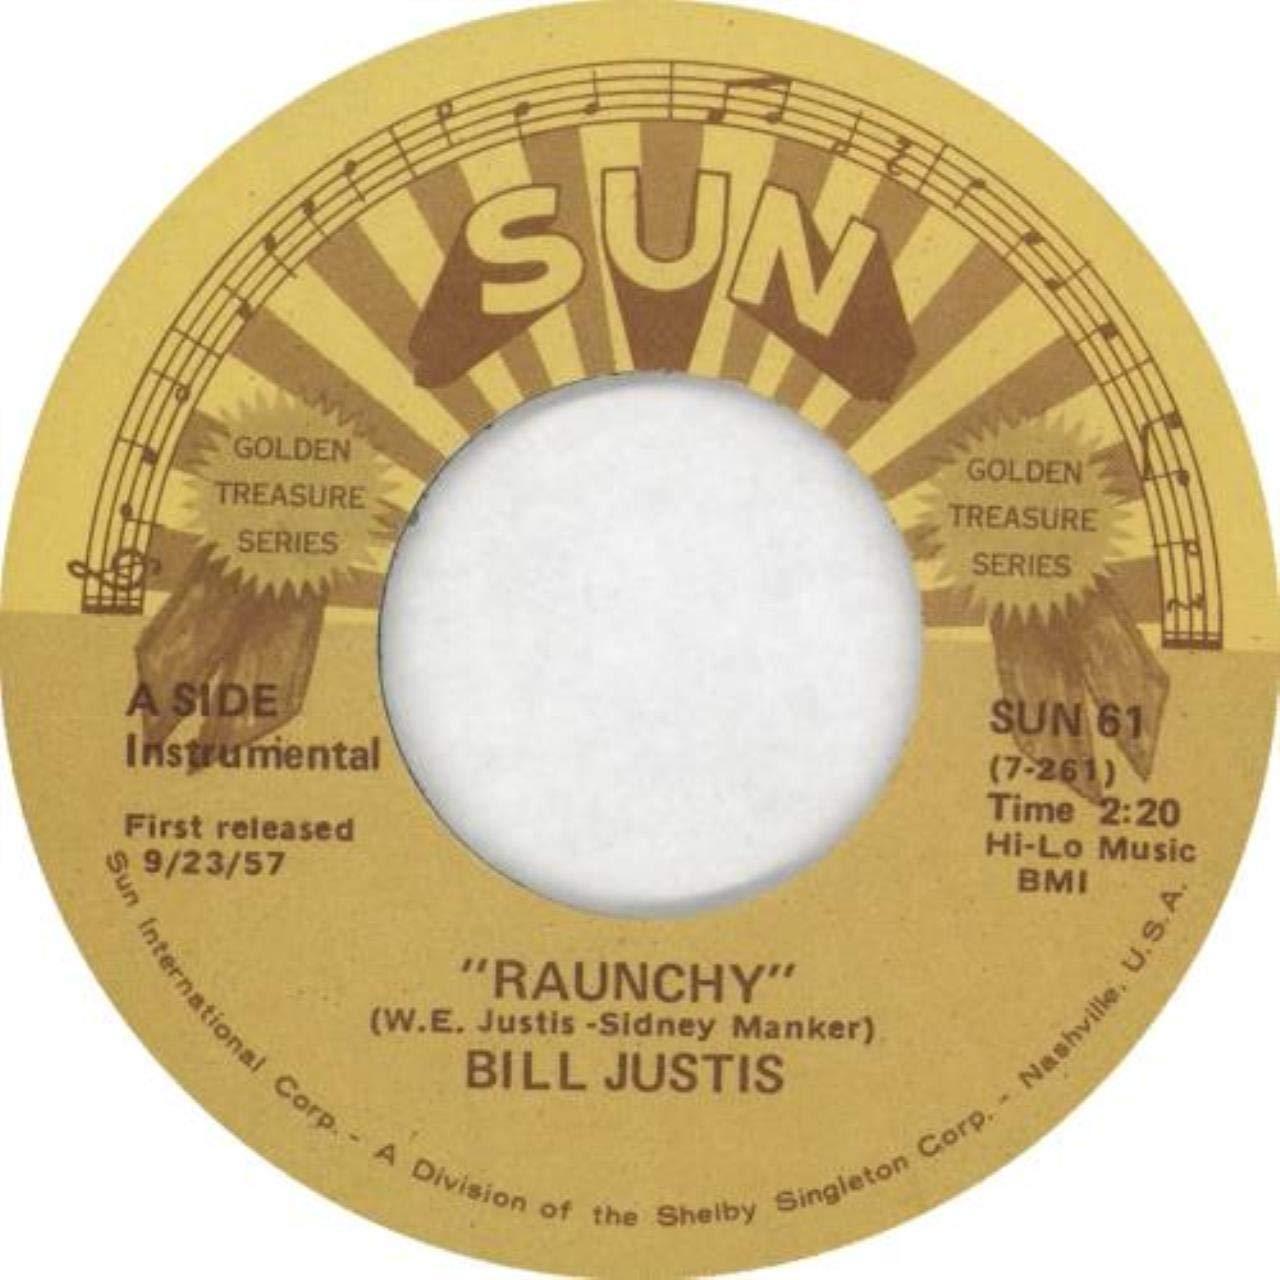 Bill Justis - Raunchy / The Midnite Man - Amazon.com Music